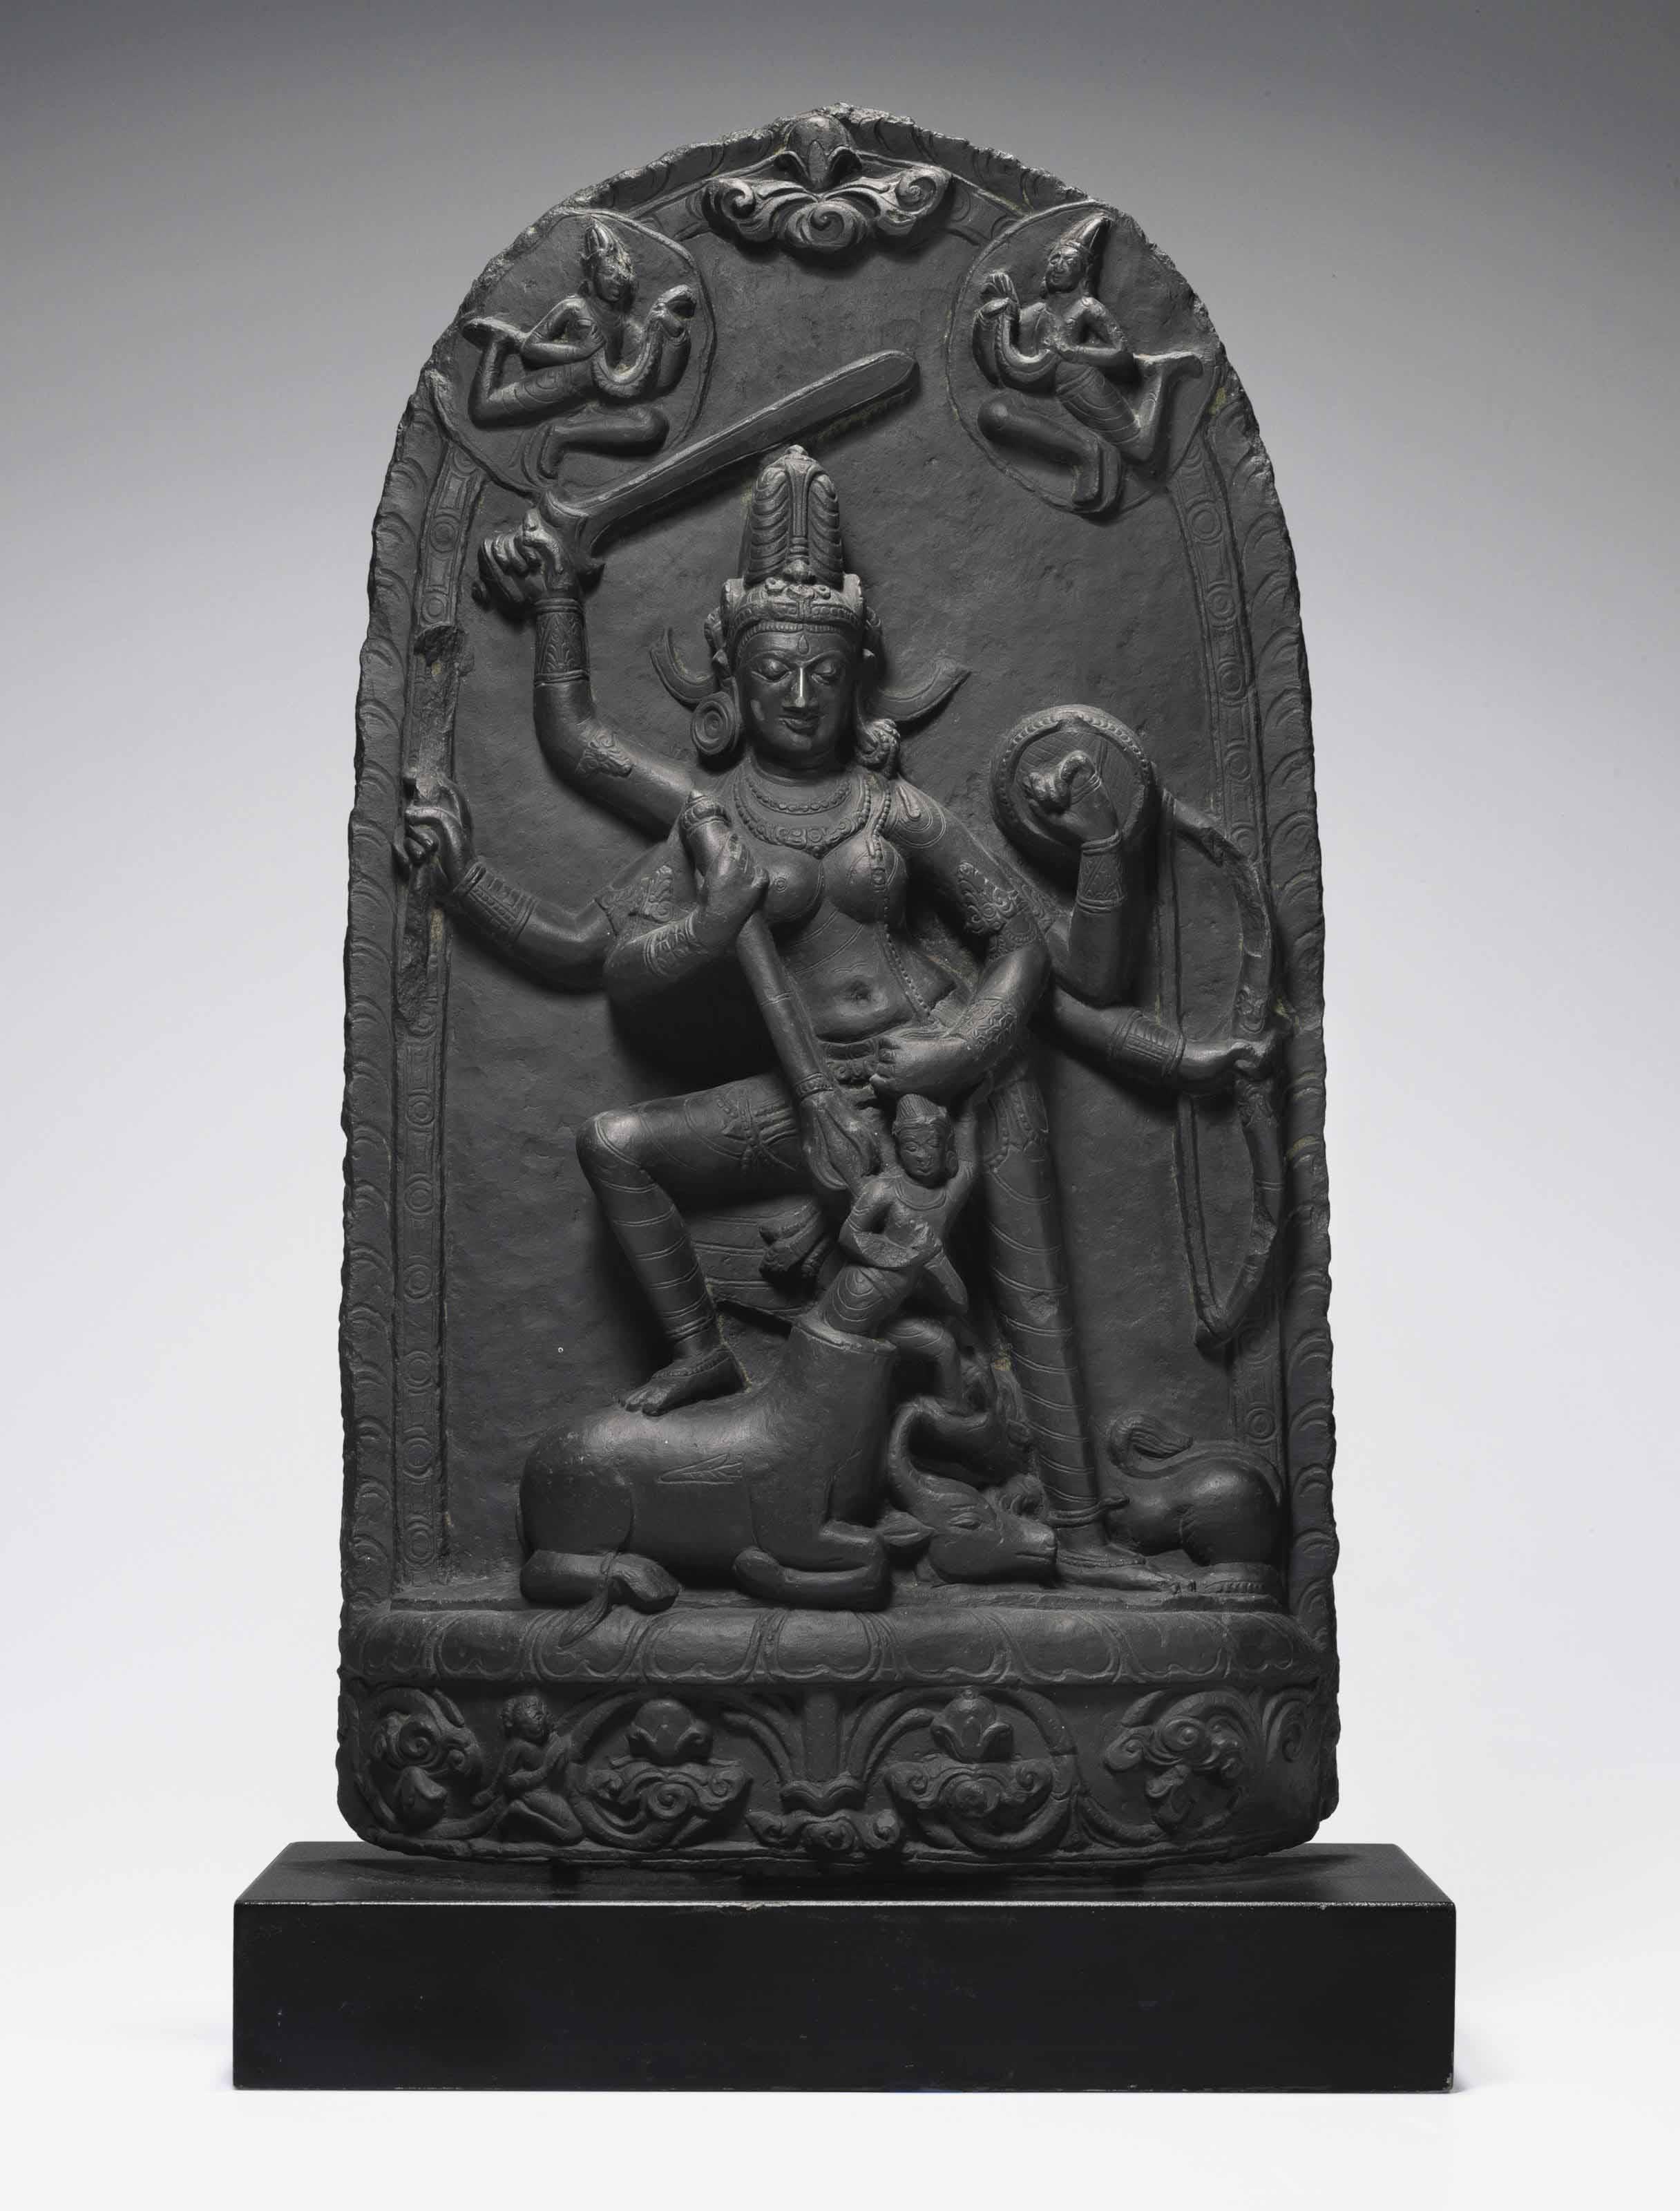 A black stone stele of Durga Mahishasuramardini